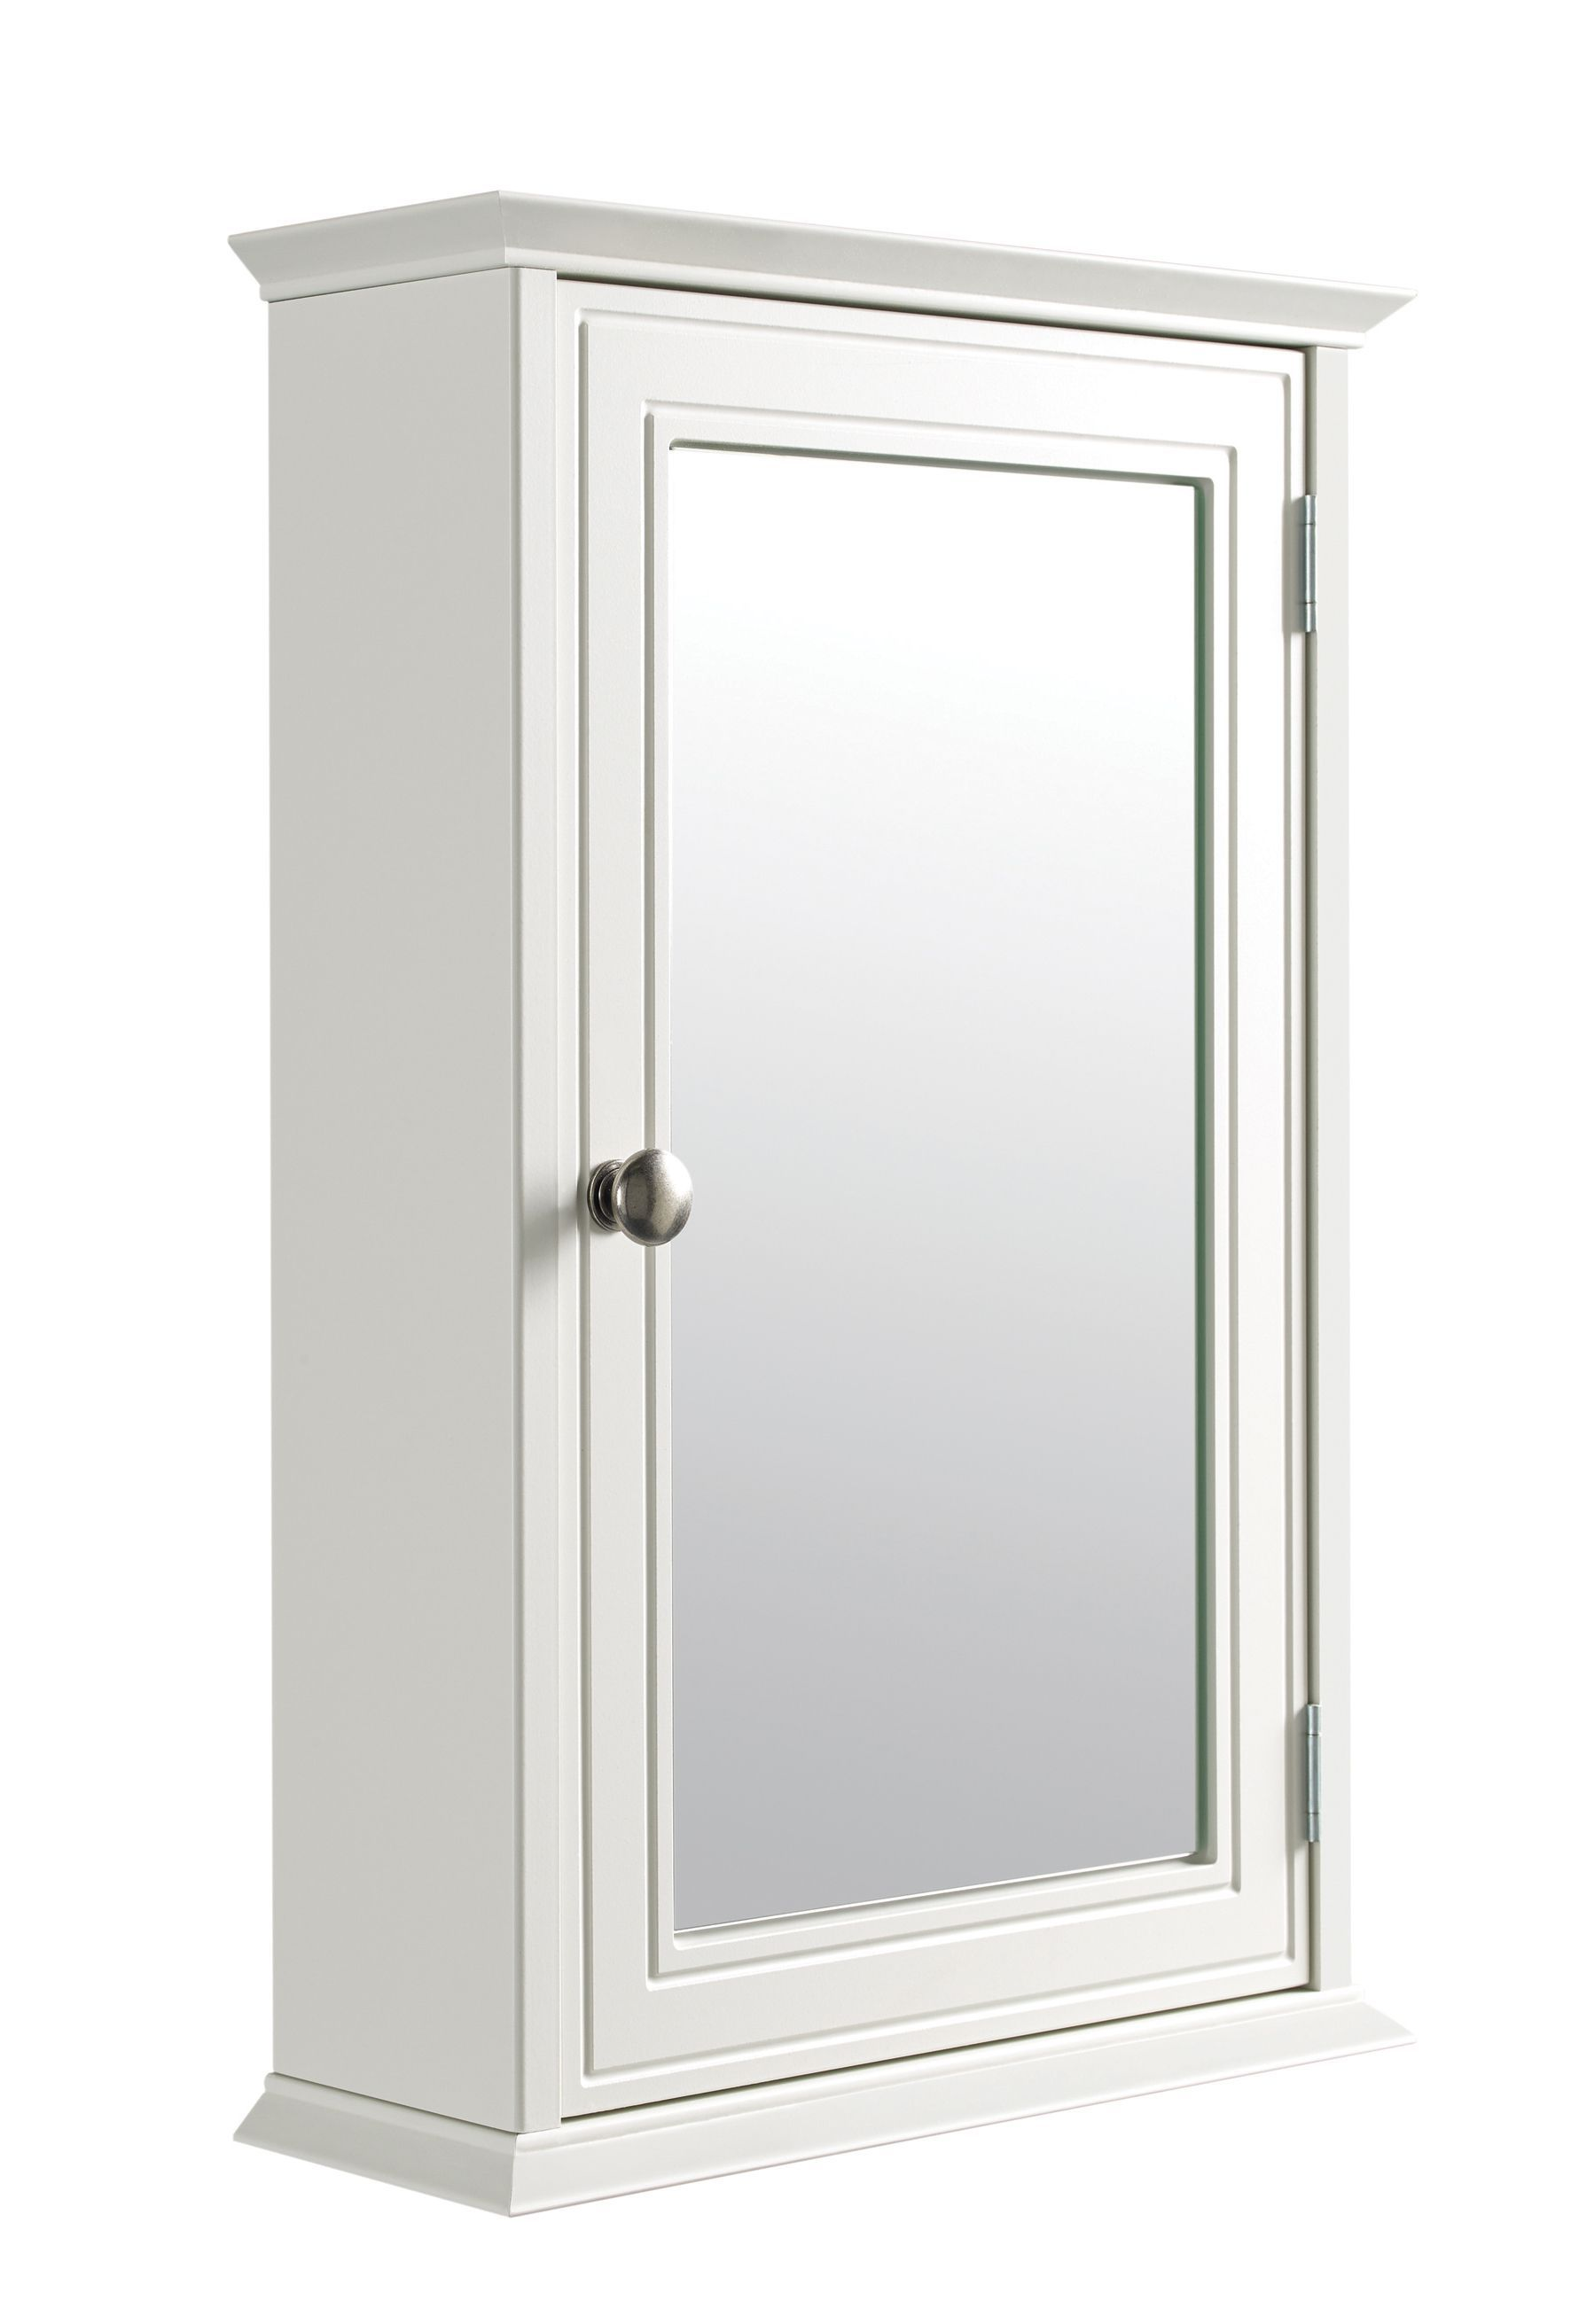 Cooke & Lewis Romano Single Door White Mirror Cabinet | Departments ...